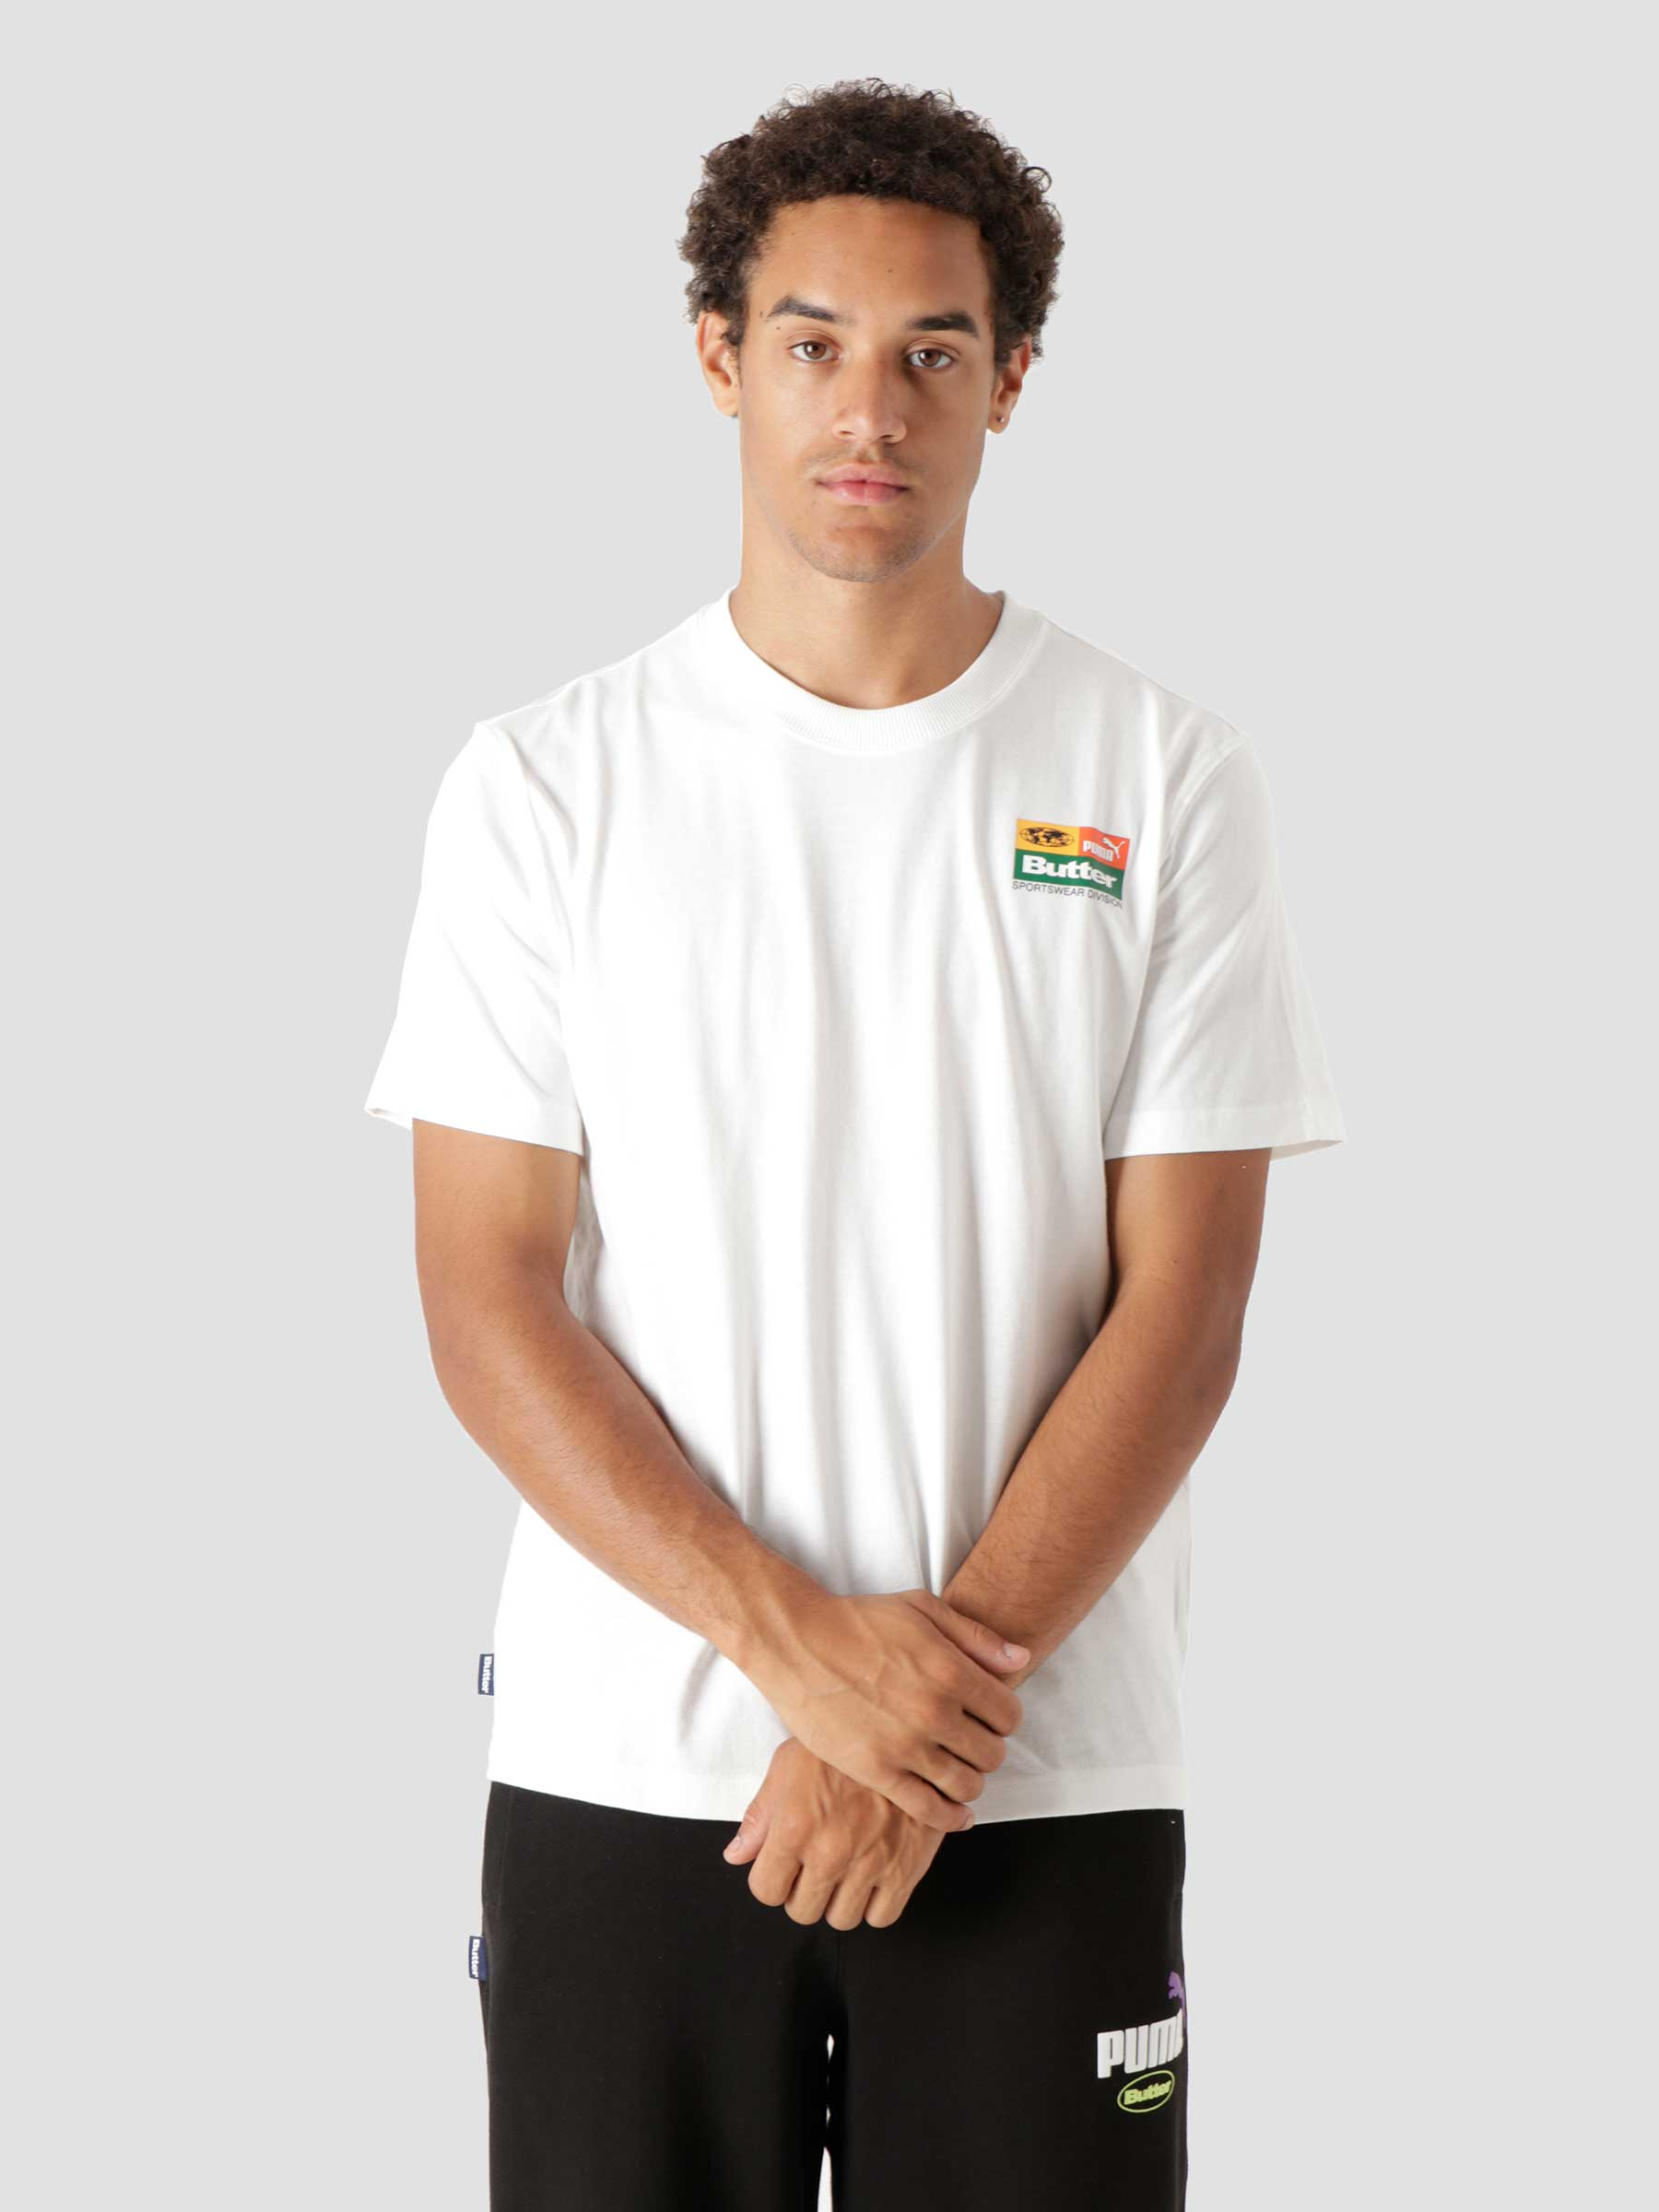 Puma X Butter Goods Graphic T Shirt Puma White 53244202